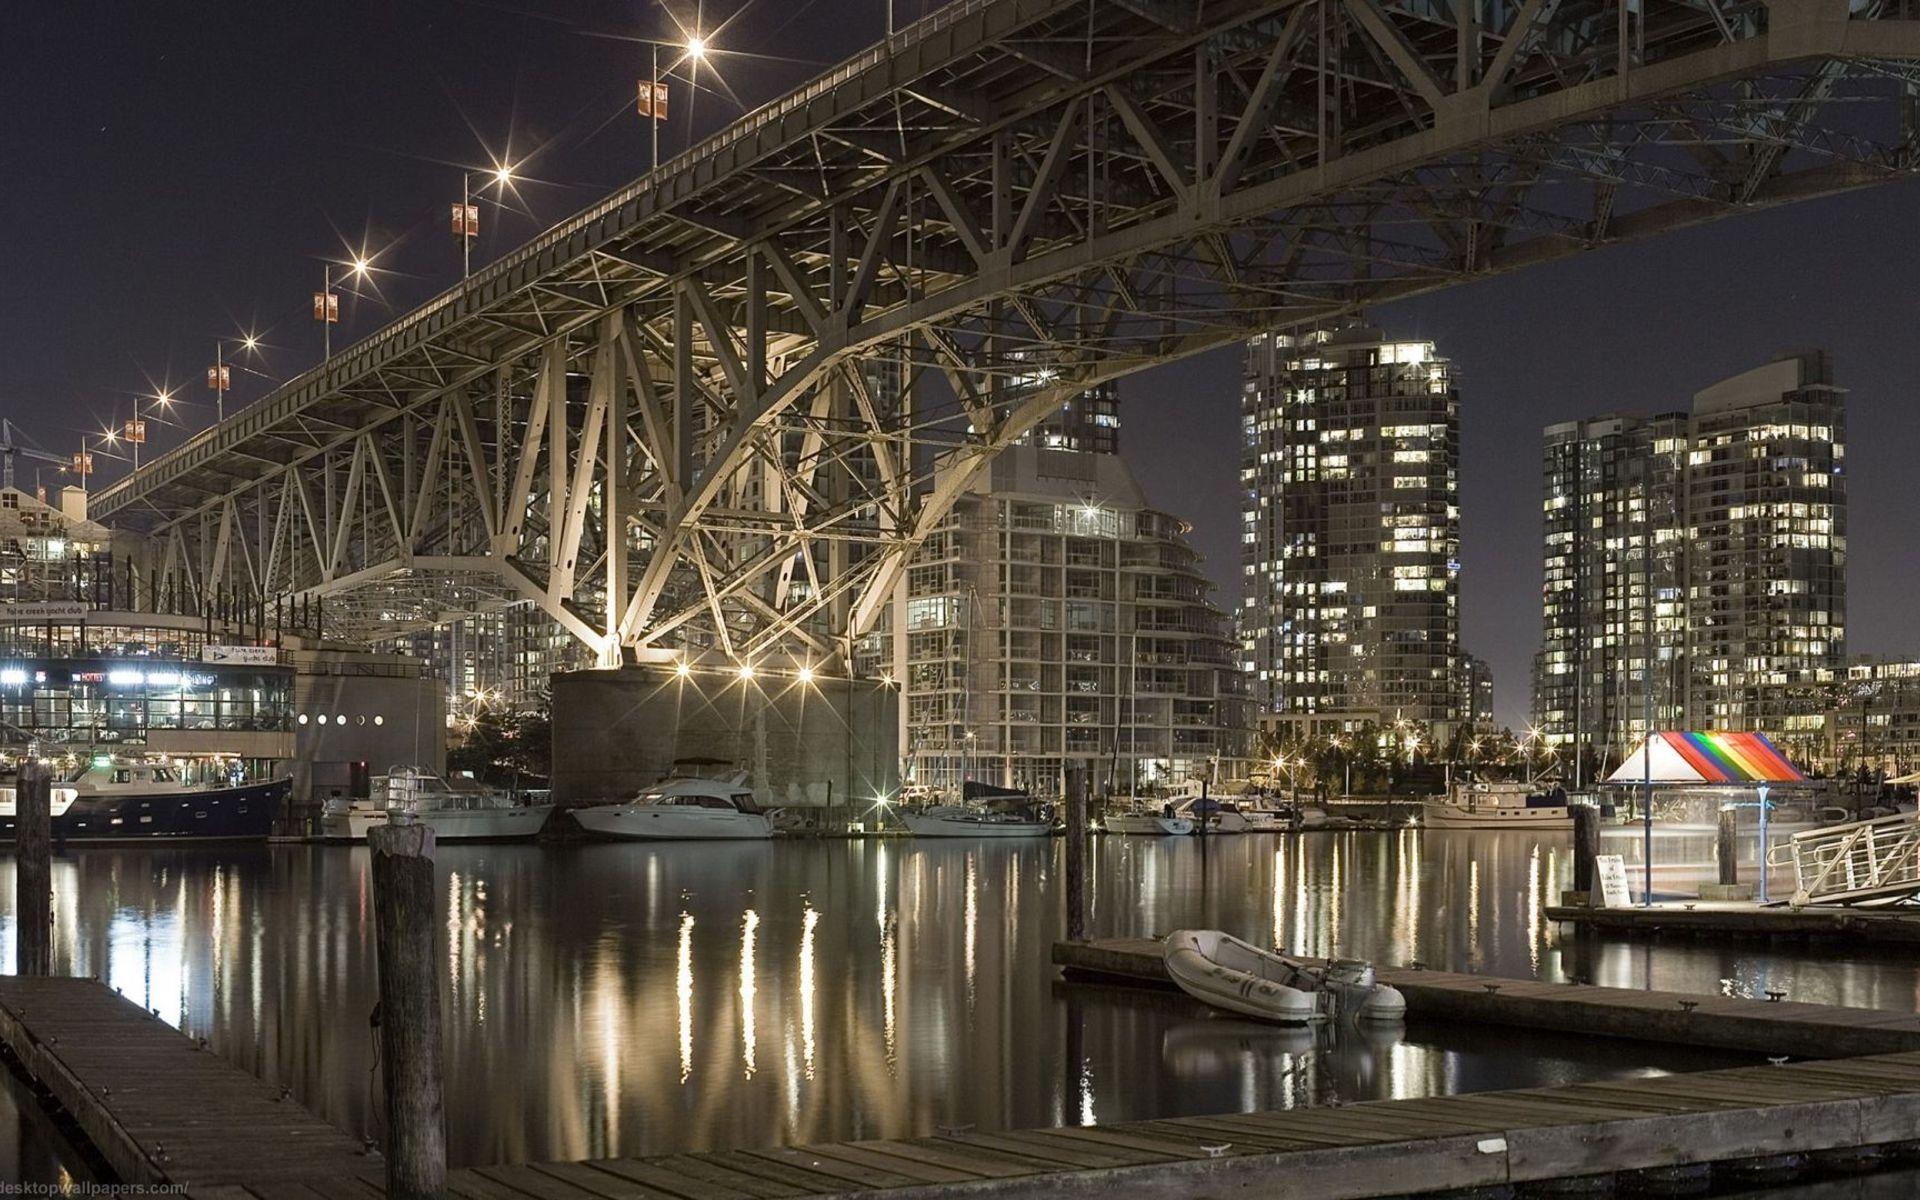 From Under The Bridge 1920x1200 wallpaper